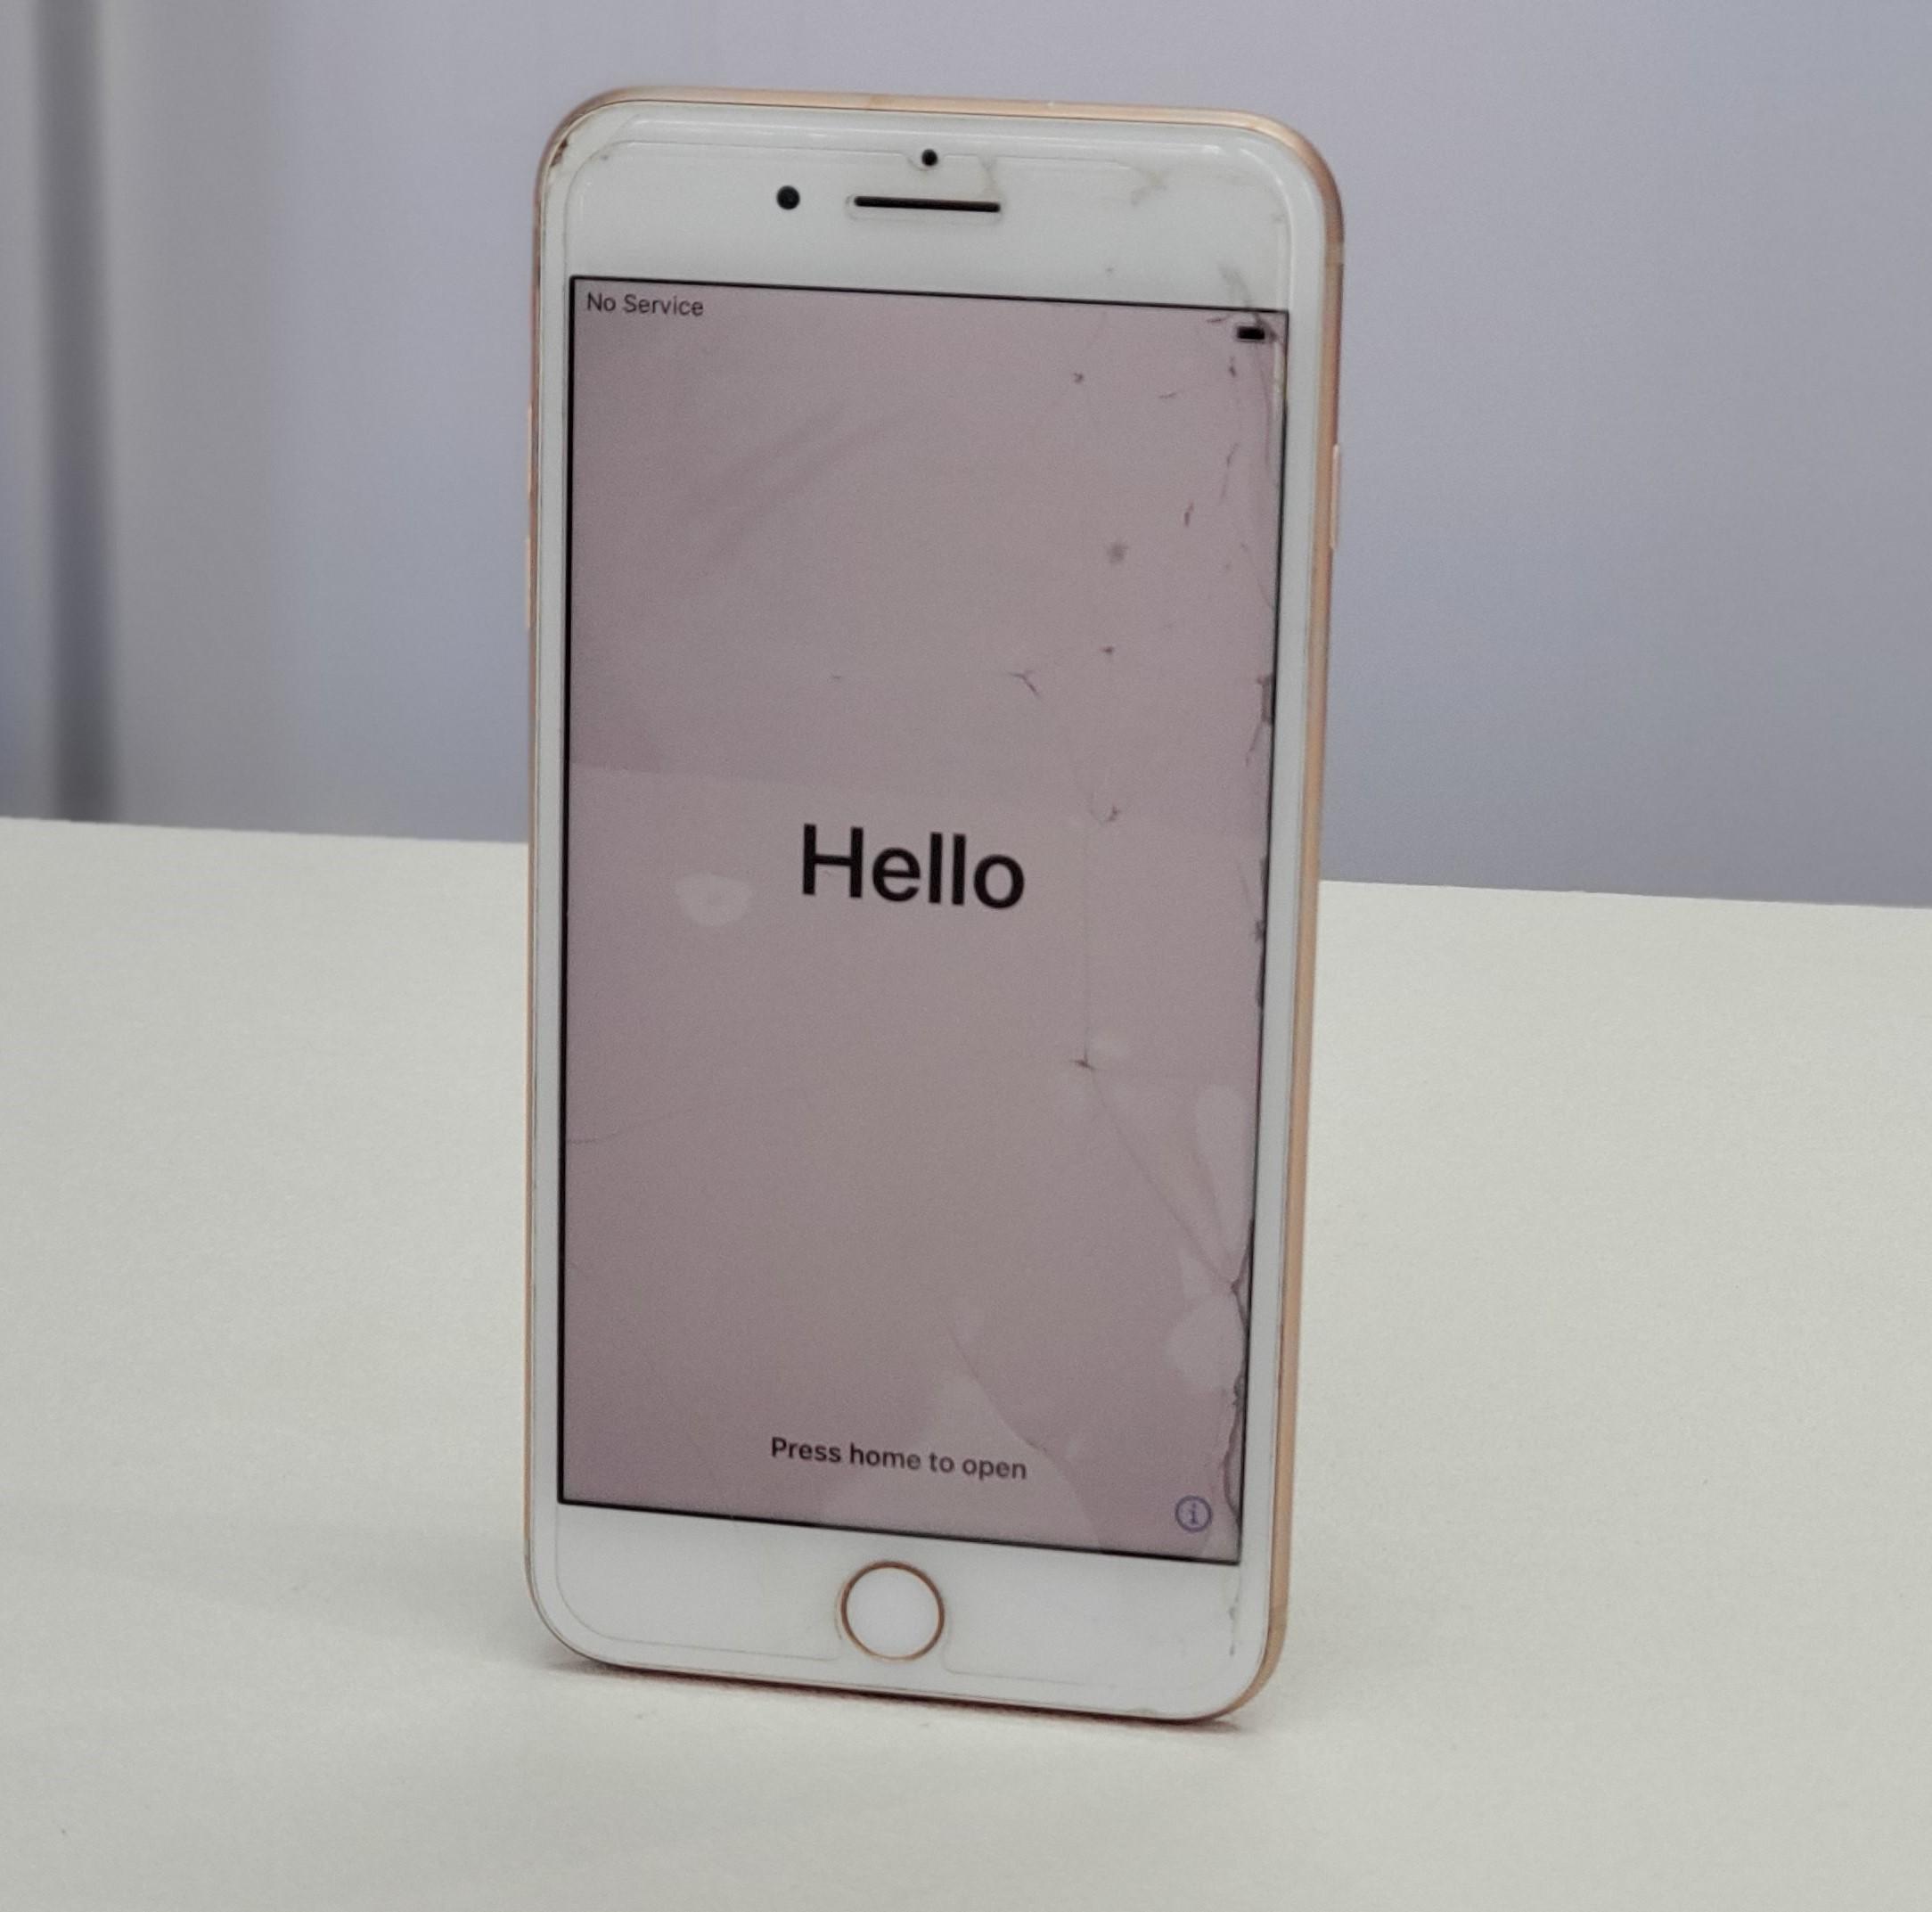 iPhone screen replacement ifixdallas plano